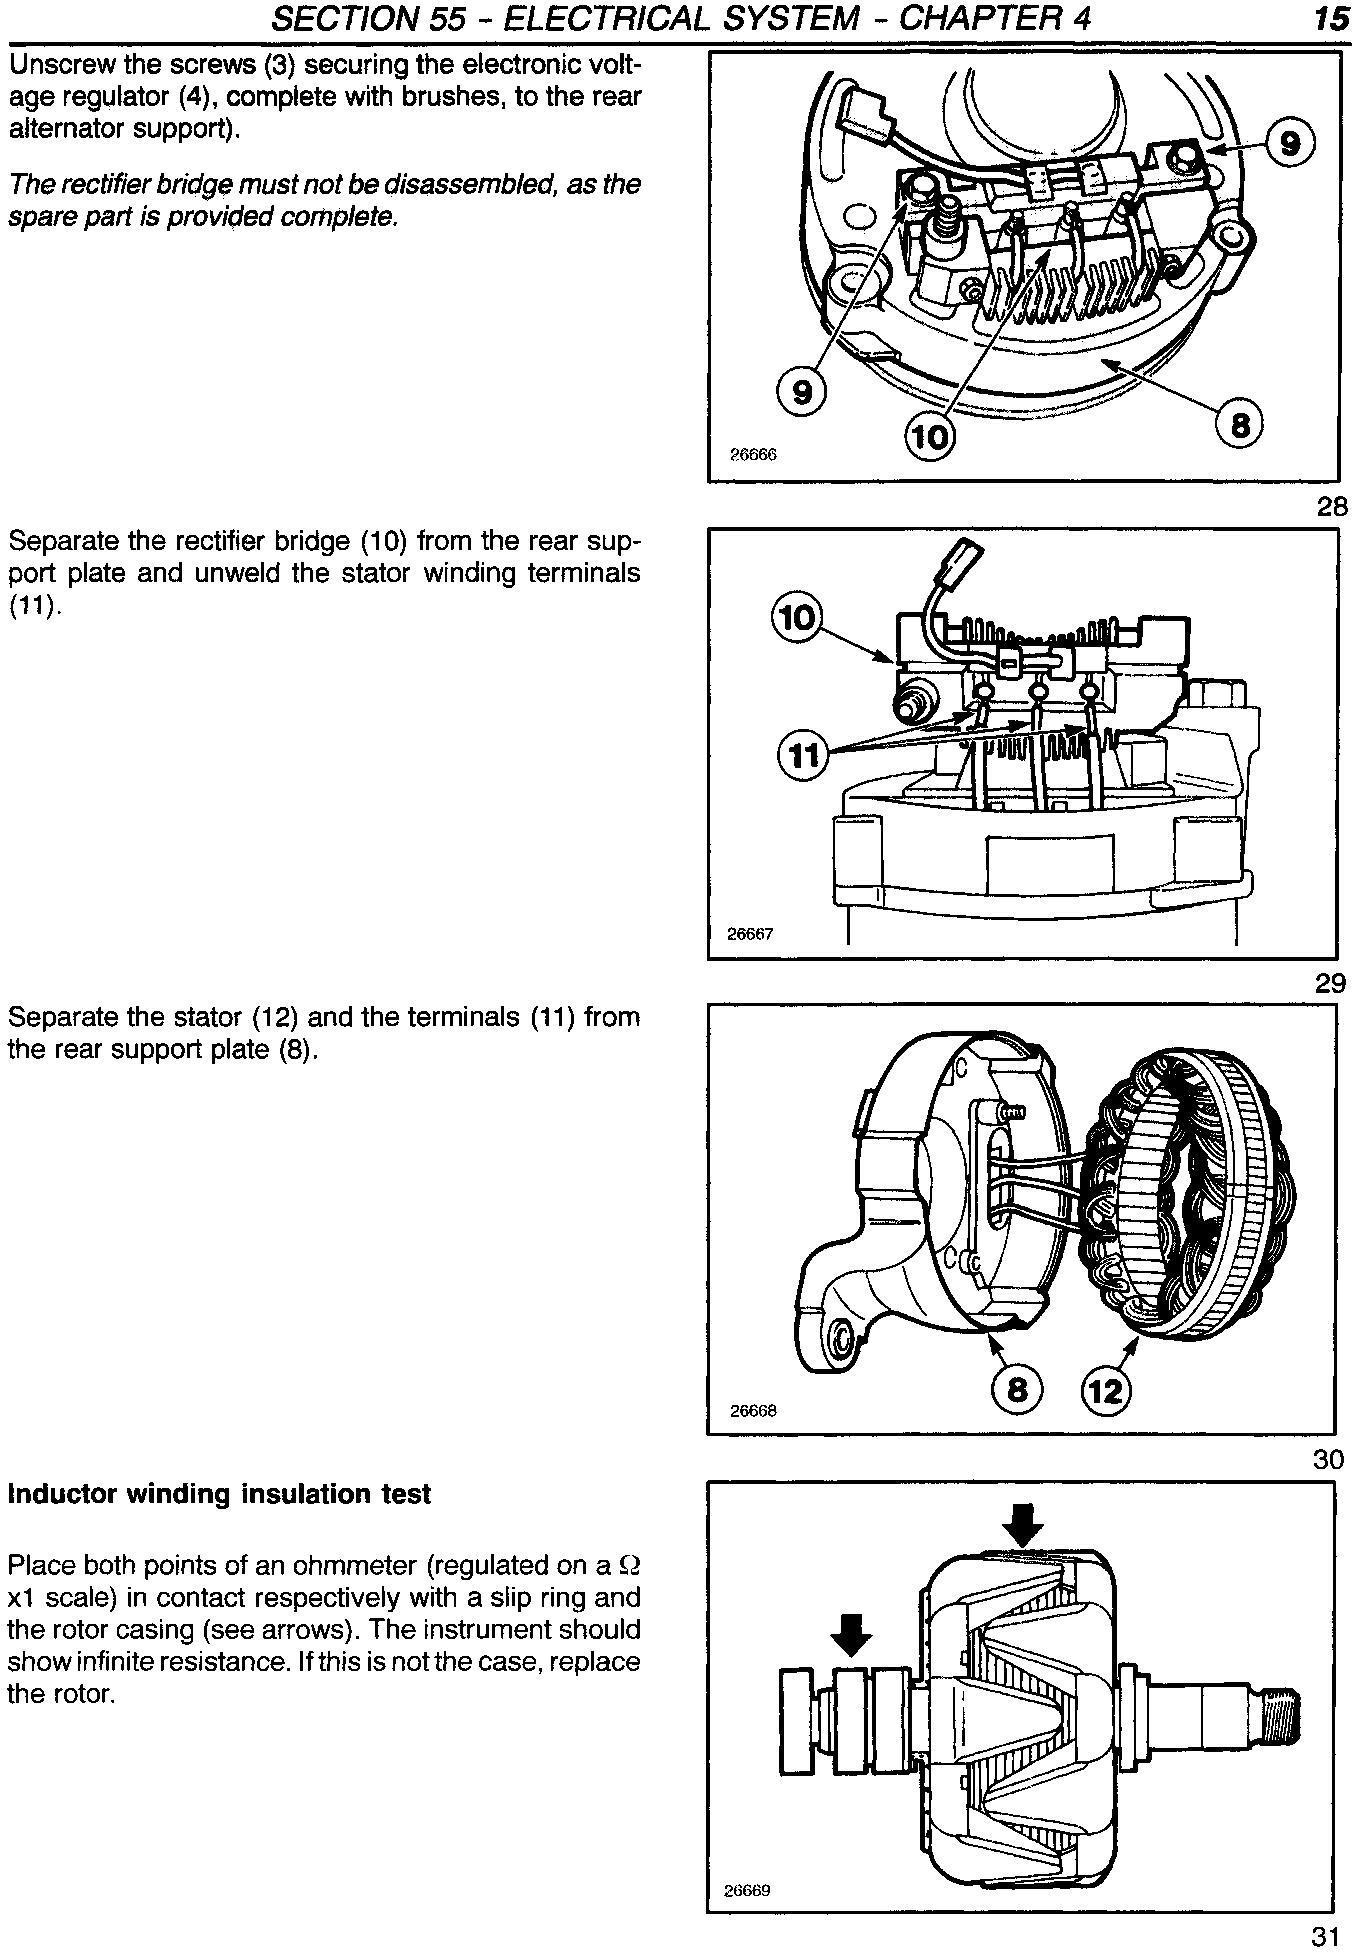 New Holland TK76, TK85, TK85M Crawler Tractor Complete Service Manual - 3